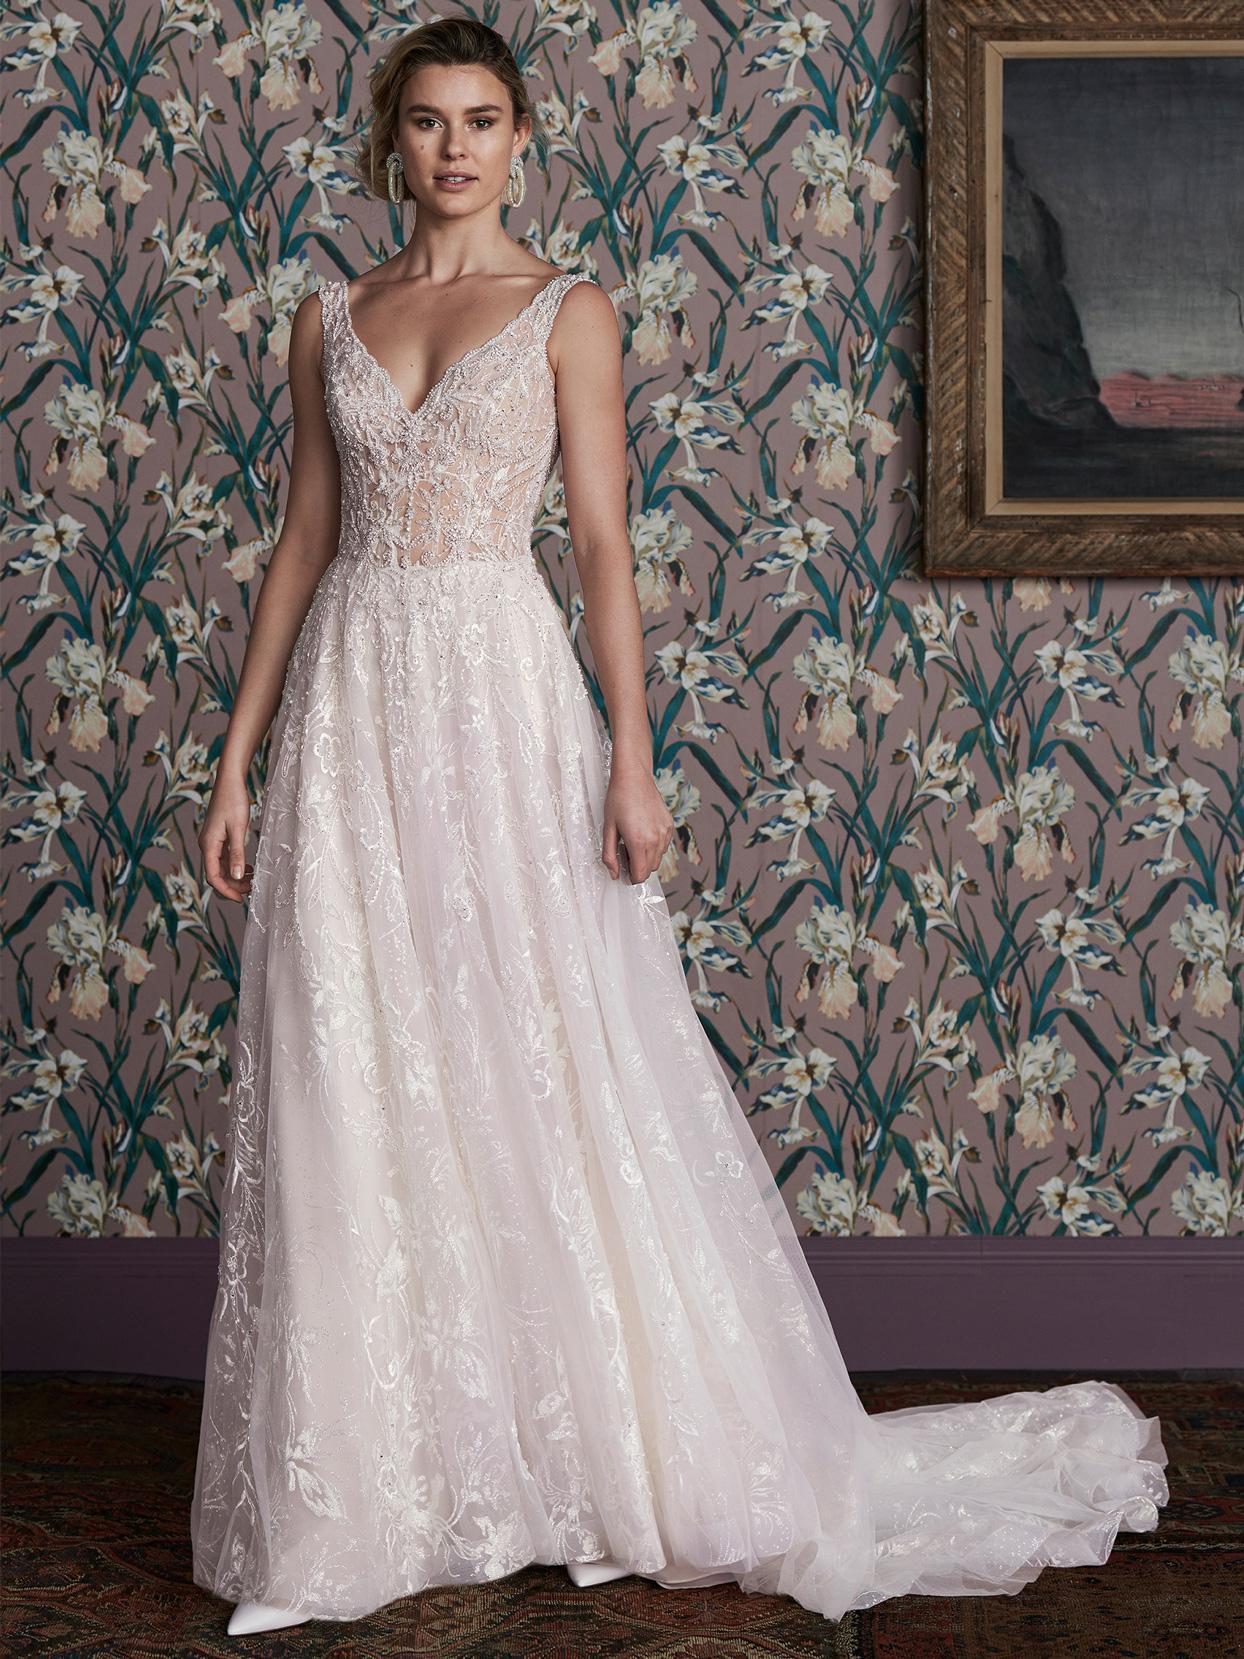 justin alexander sheer lace bodice a-line wedding dress spring 2021